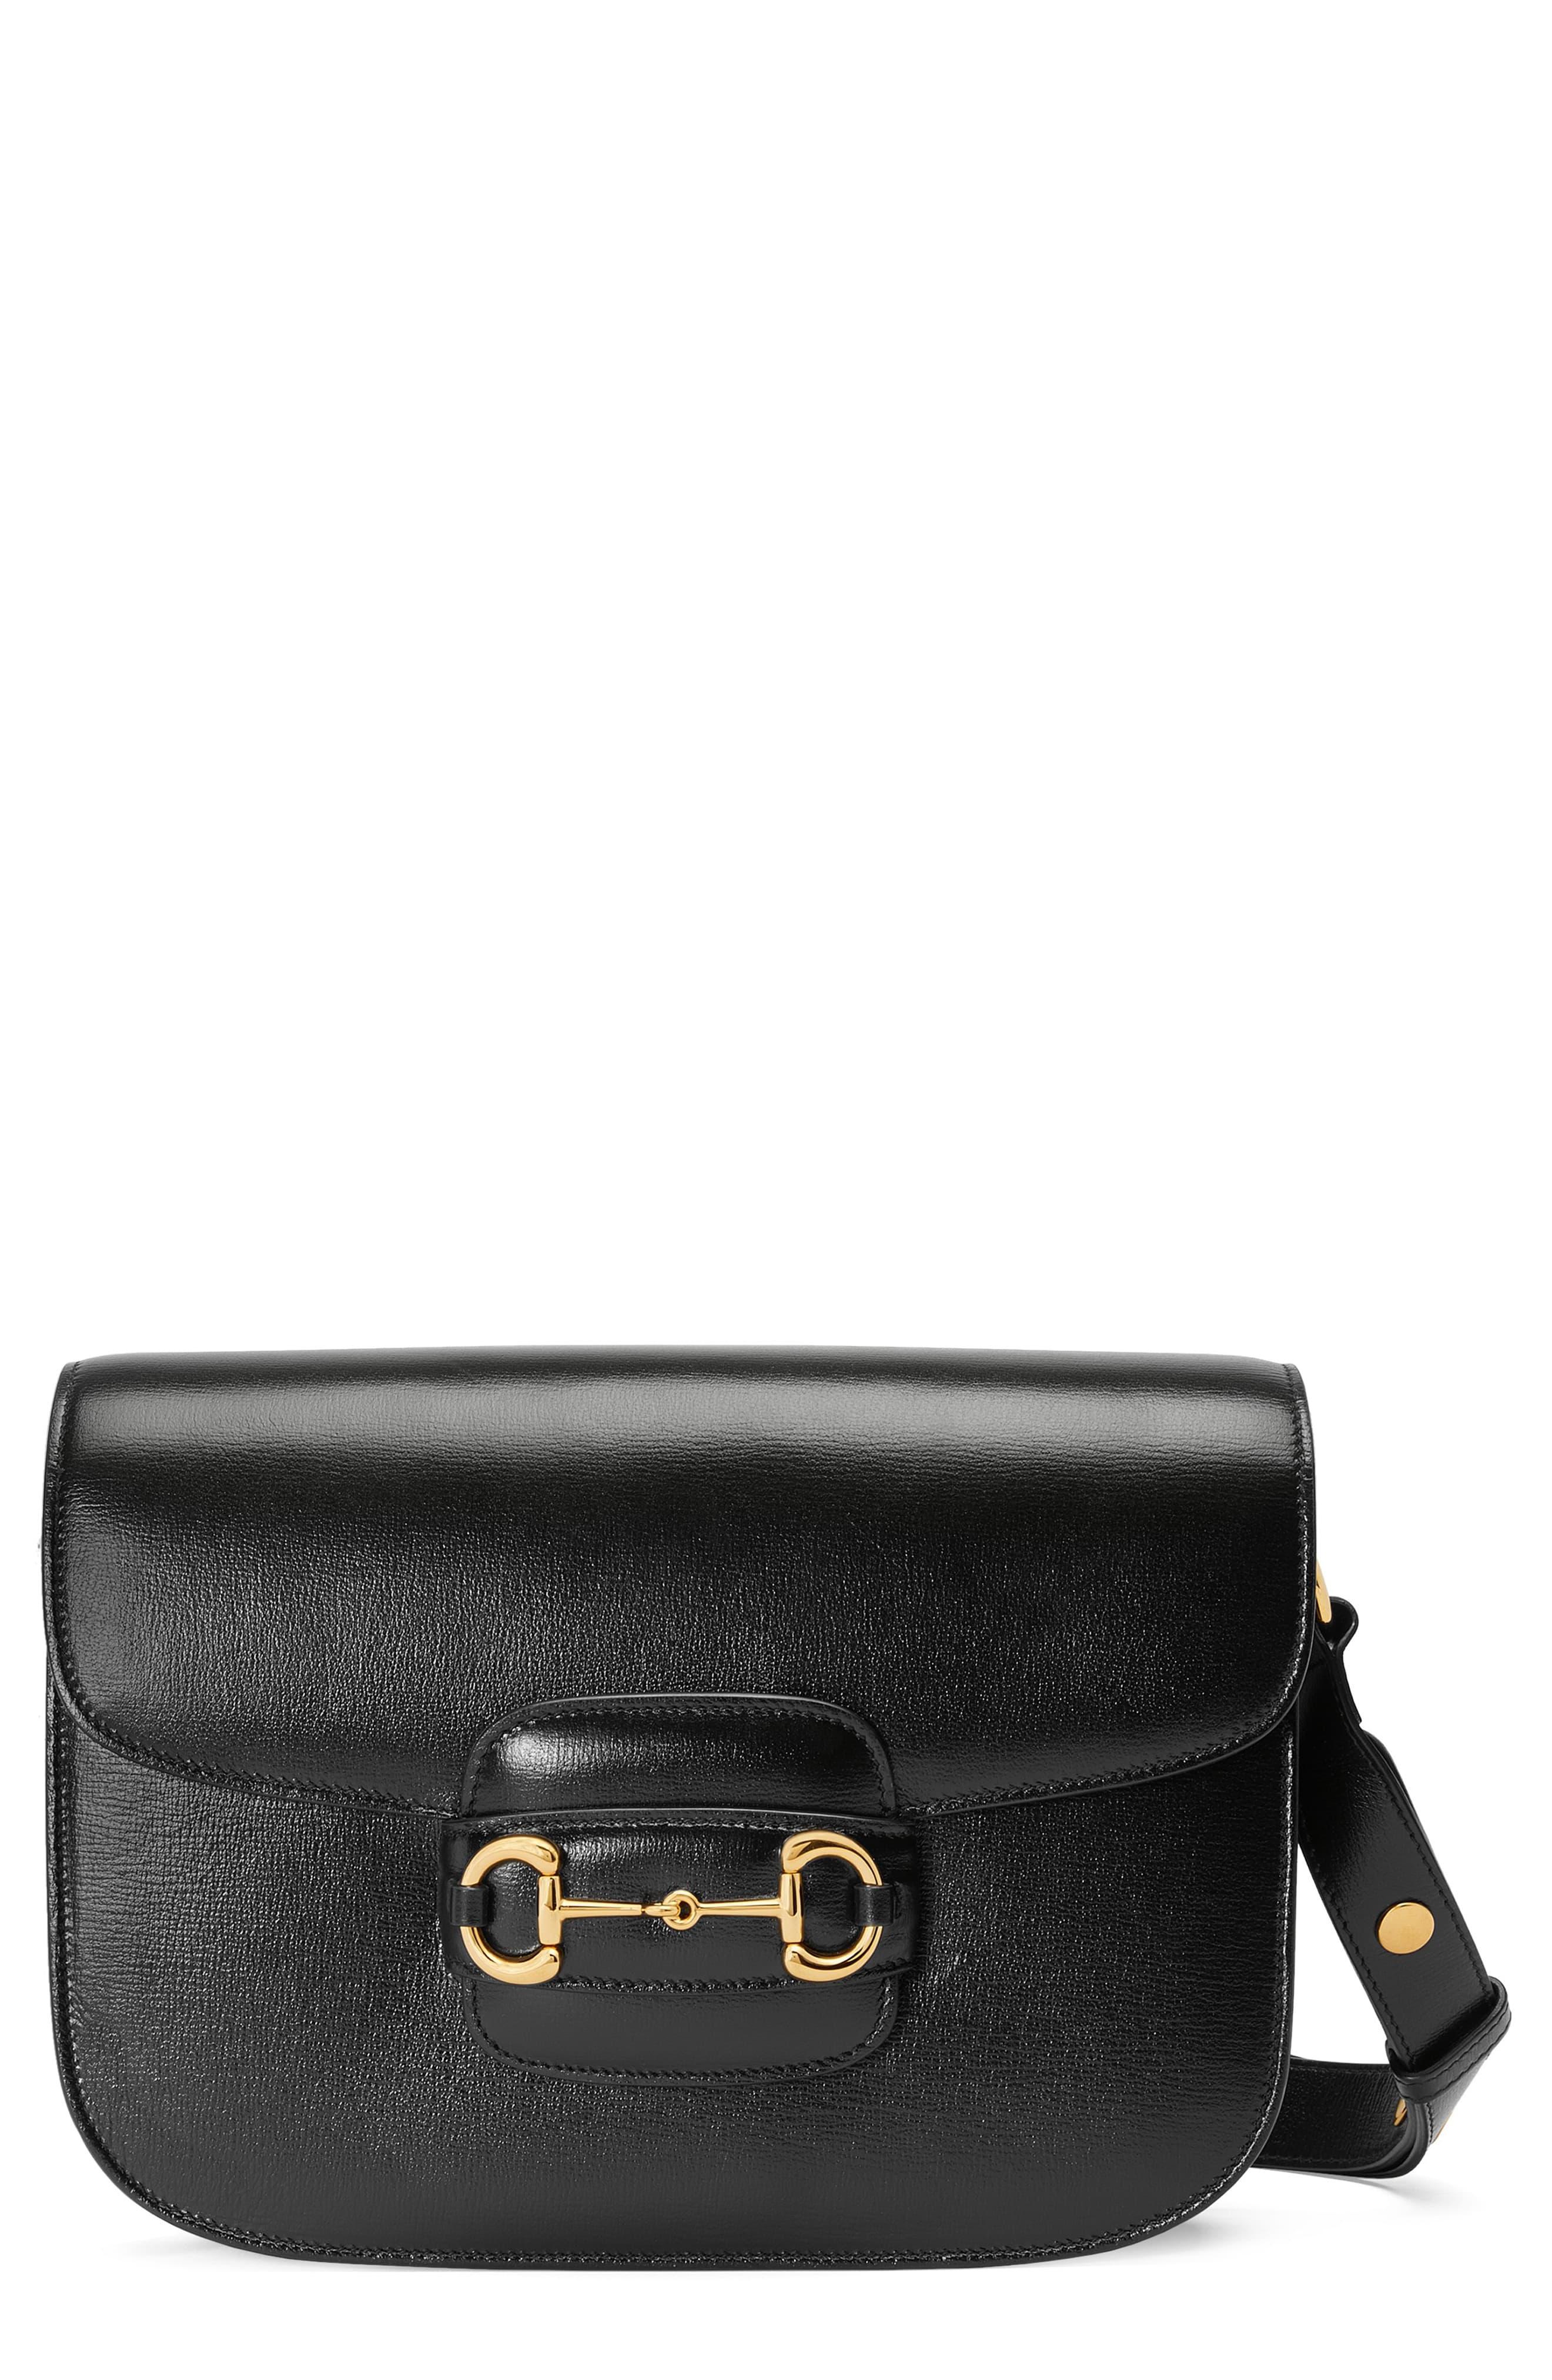 GUCCI Small 1955 Horsebit Leather Shoulder Bag, Main, color, NERO